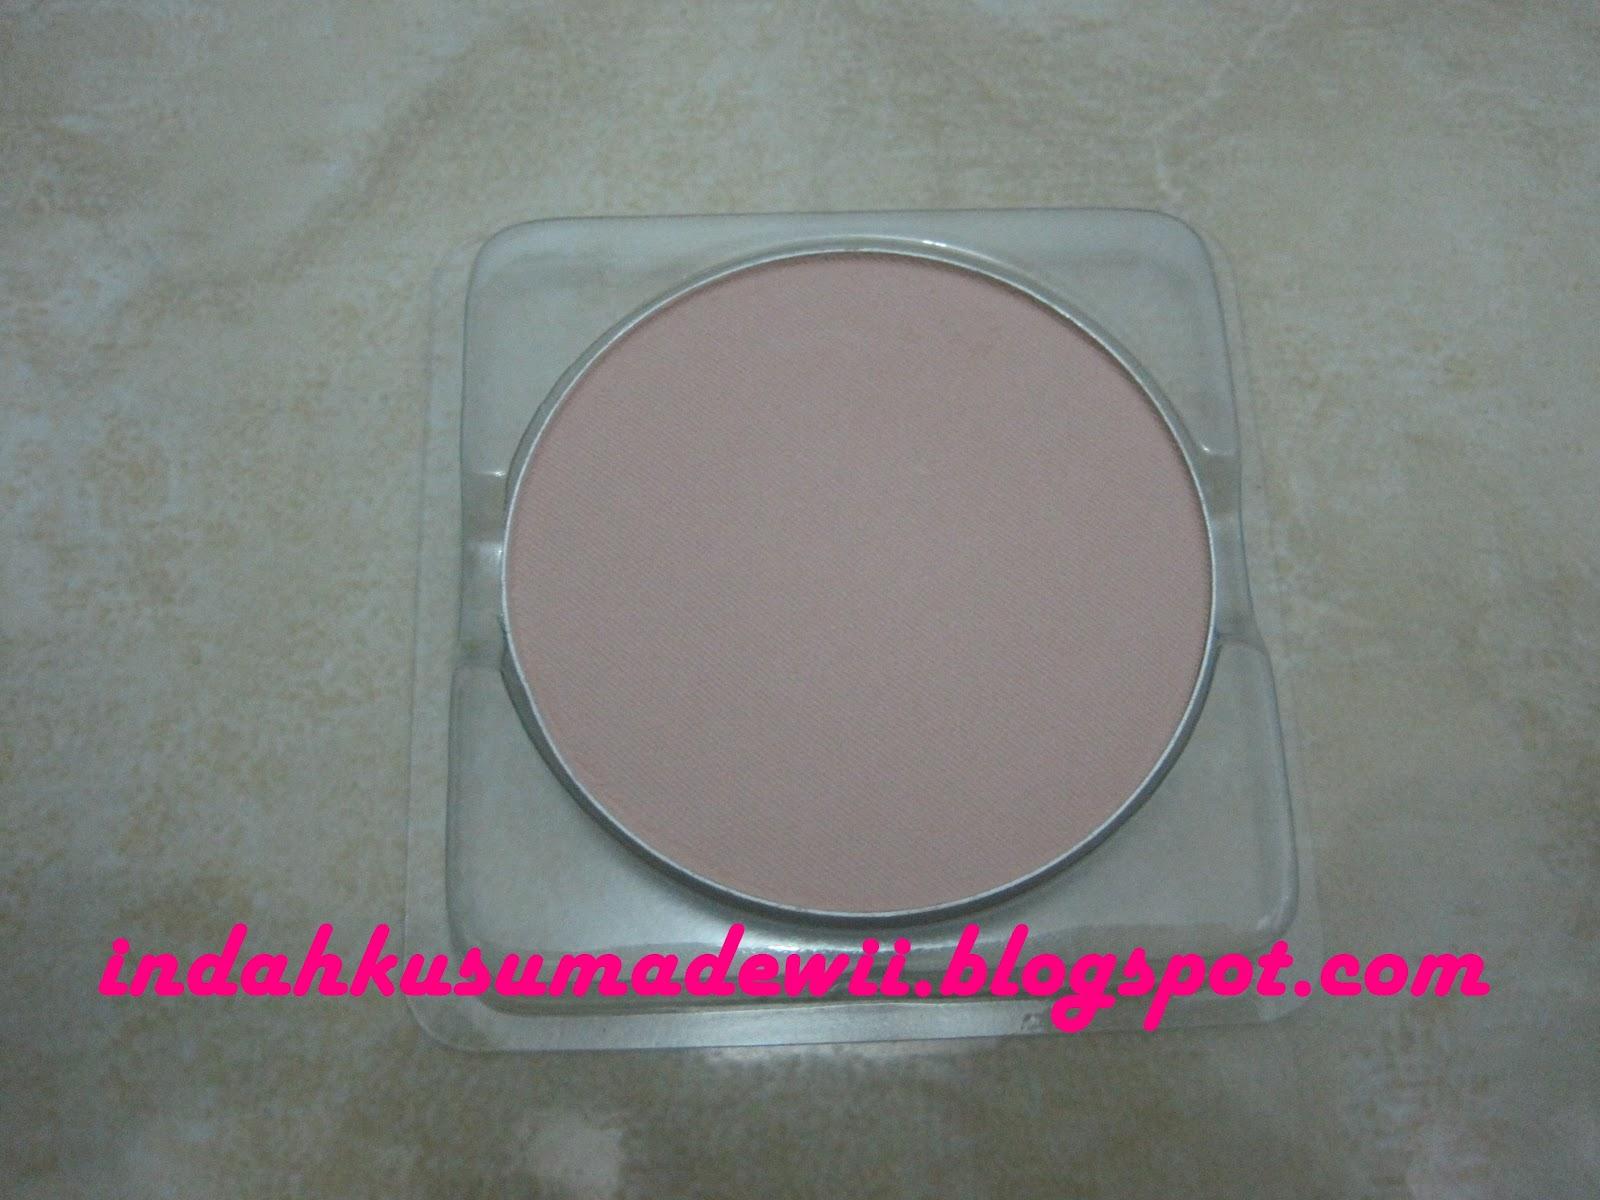 Indah Kusuma Dewi: Wardah Compact Powder Refill